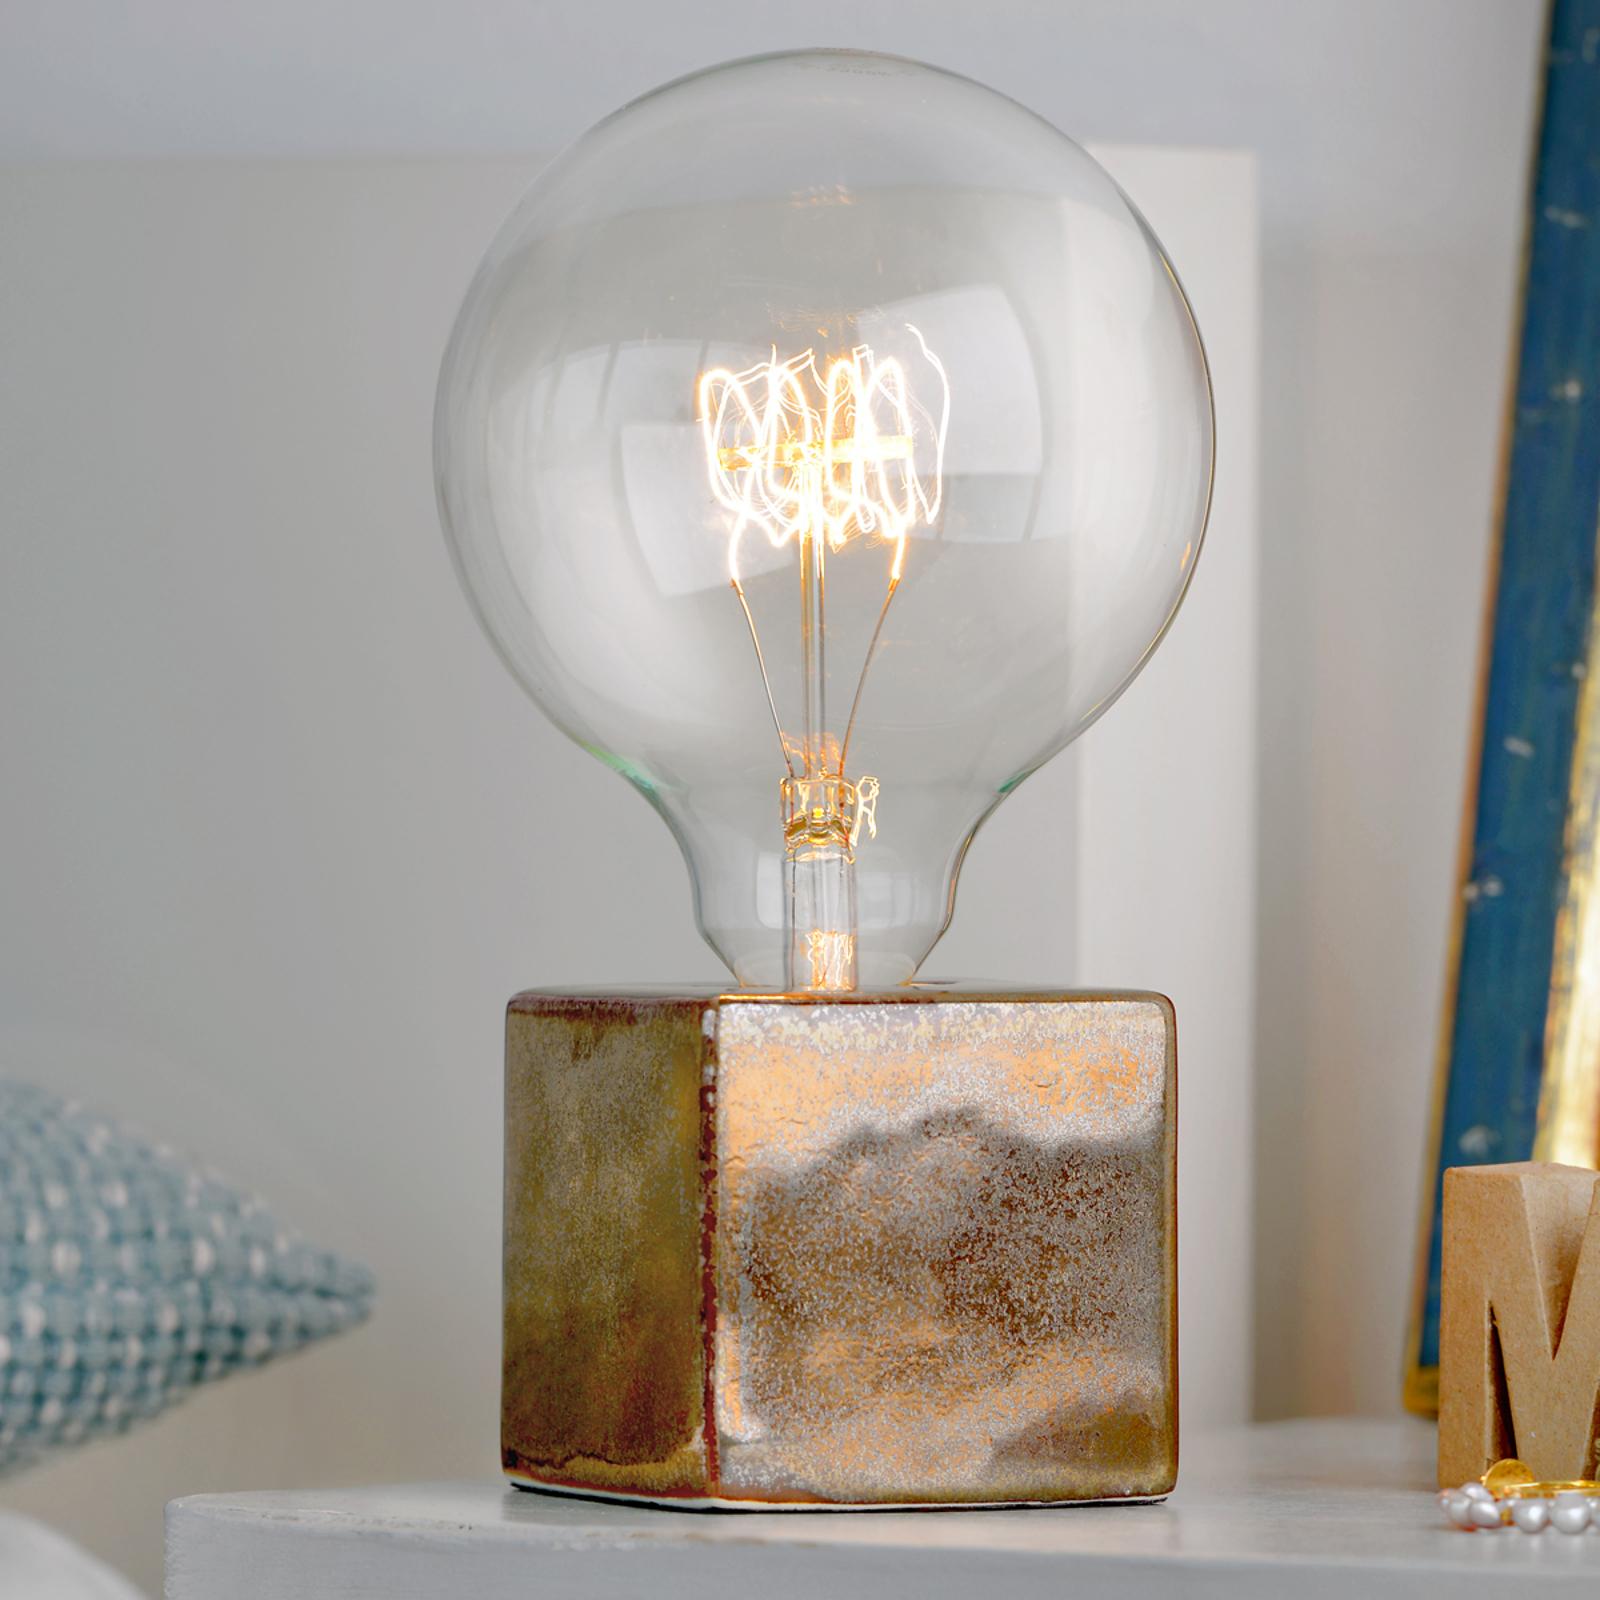 Villeroy & Boch Helsinki - pöytälamppu pronssi